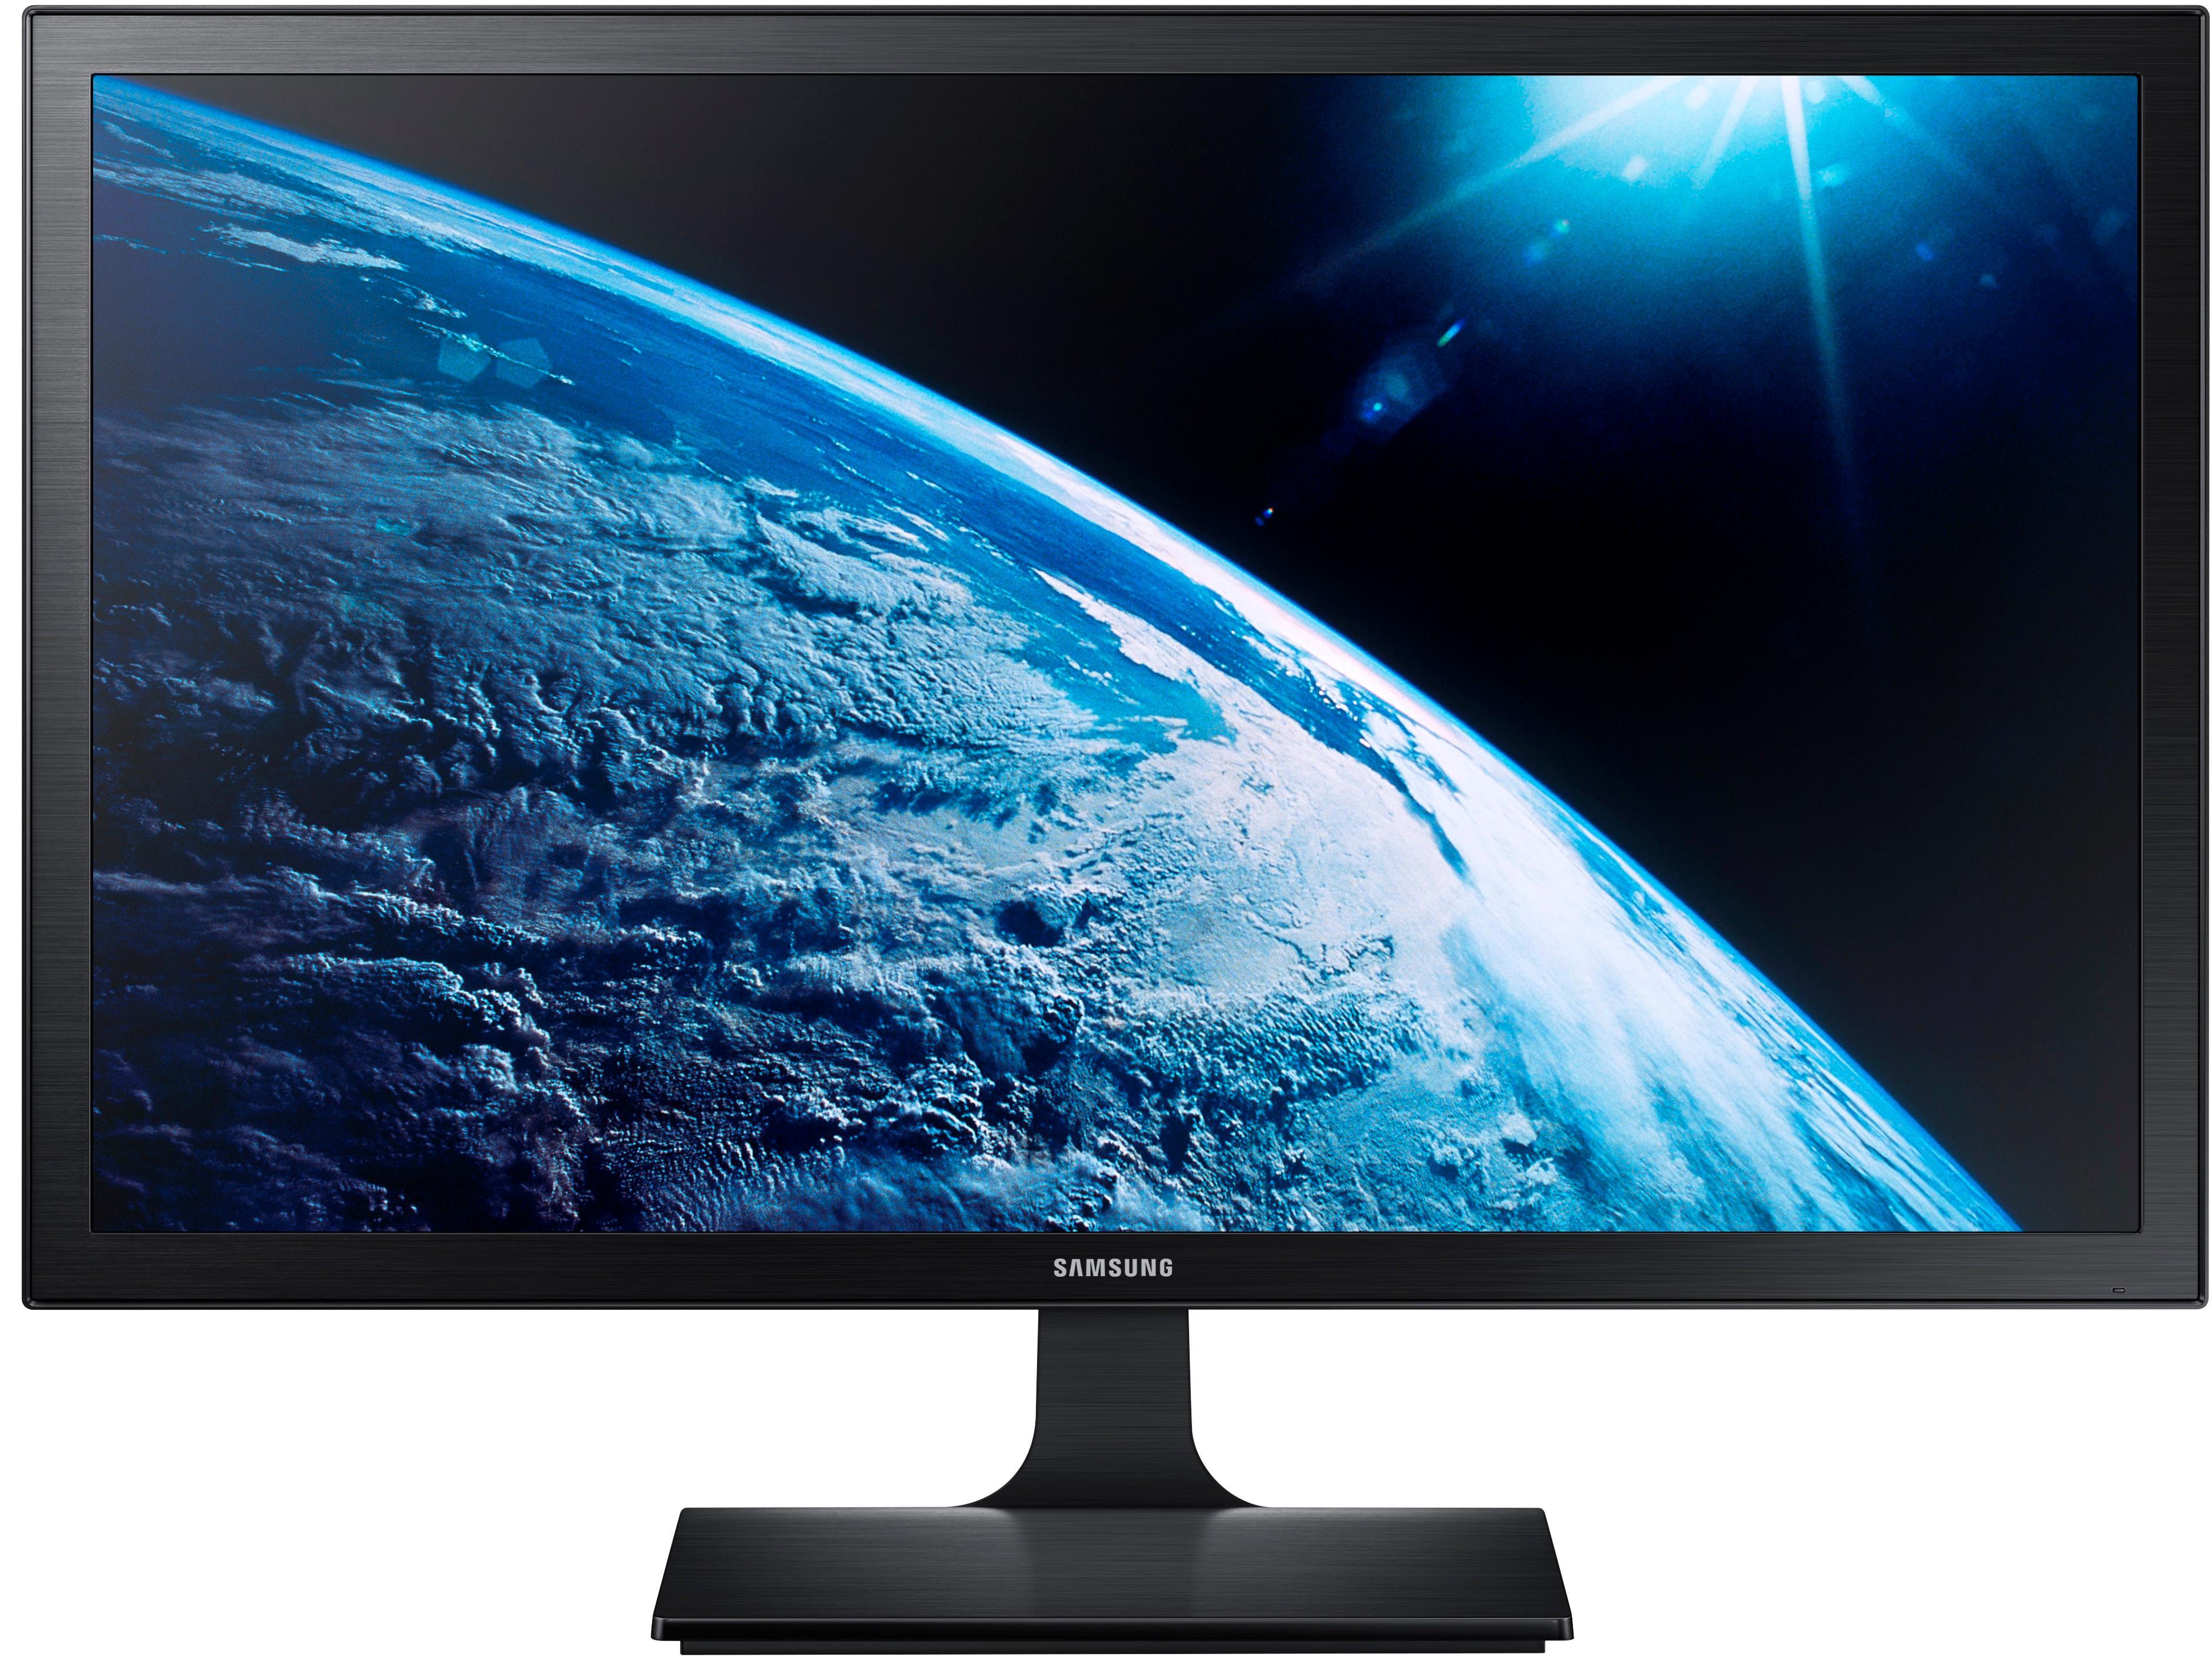 Amazon.com: Samsung 21.5-Inch Screen LED-Lit Monitor ...